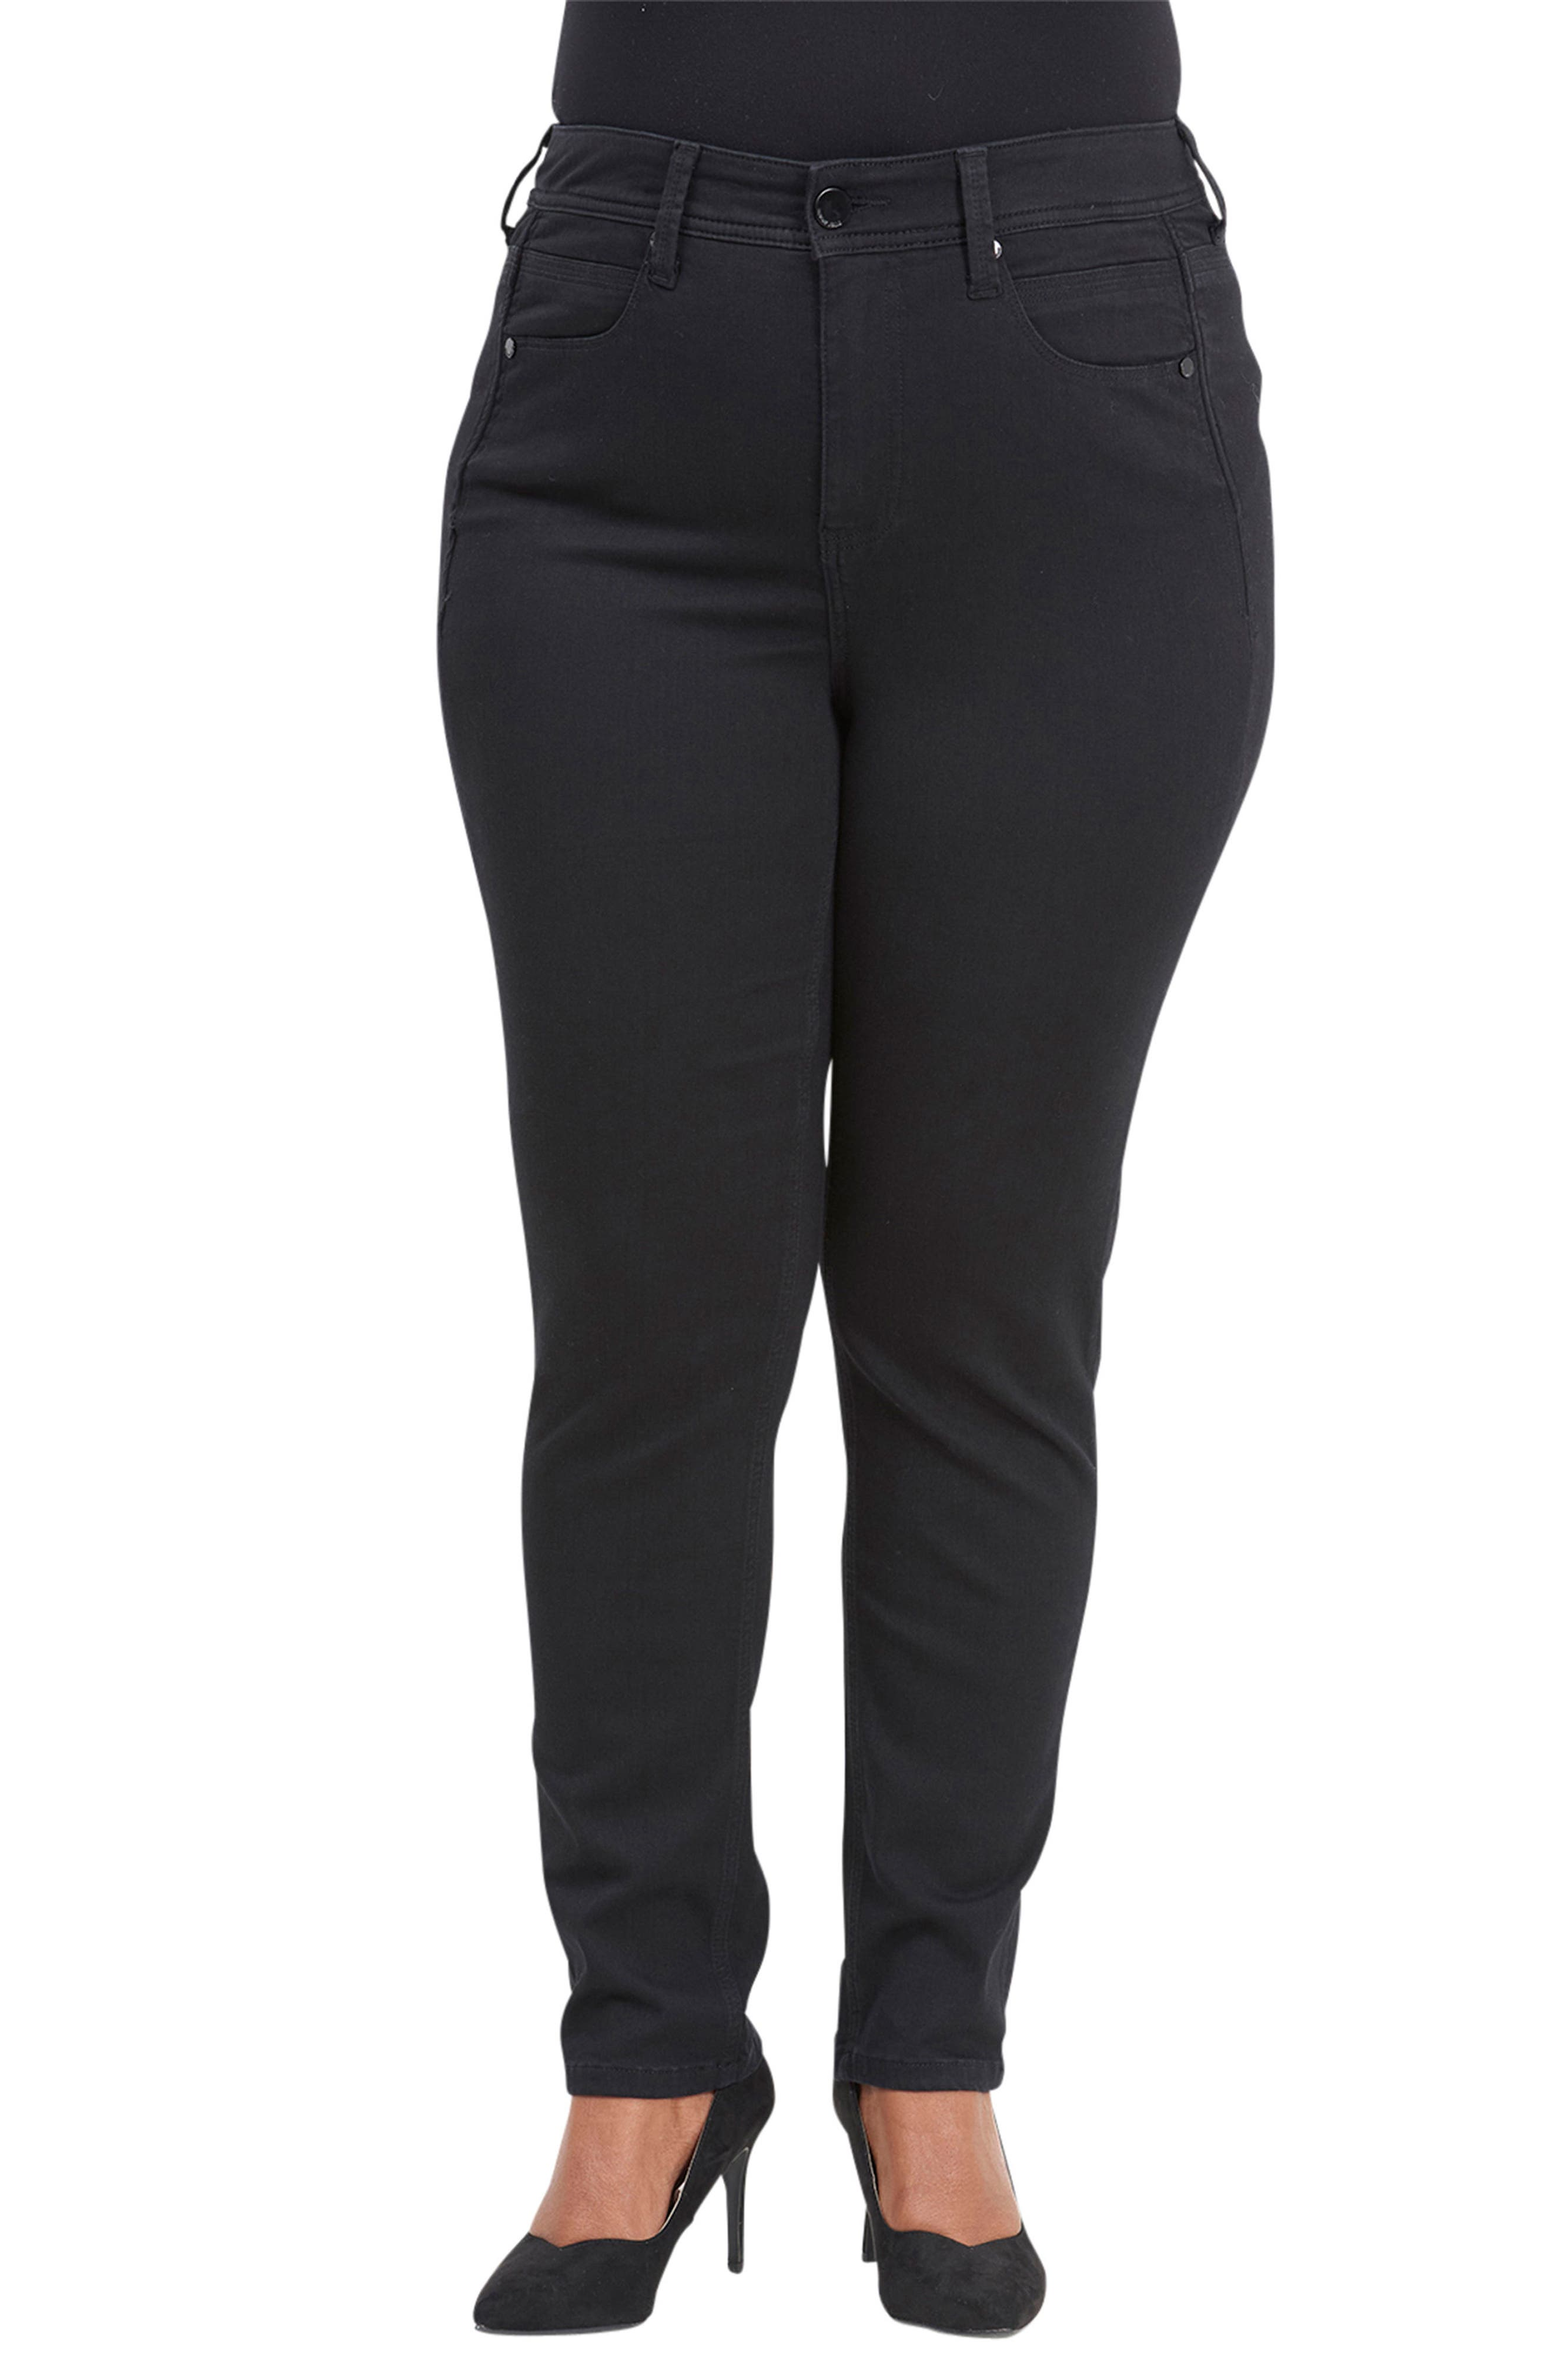 Seven7 Tummyless Skinny Jeans (Nuit) (Plus Size)